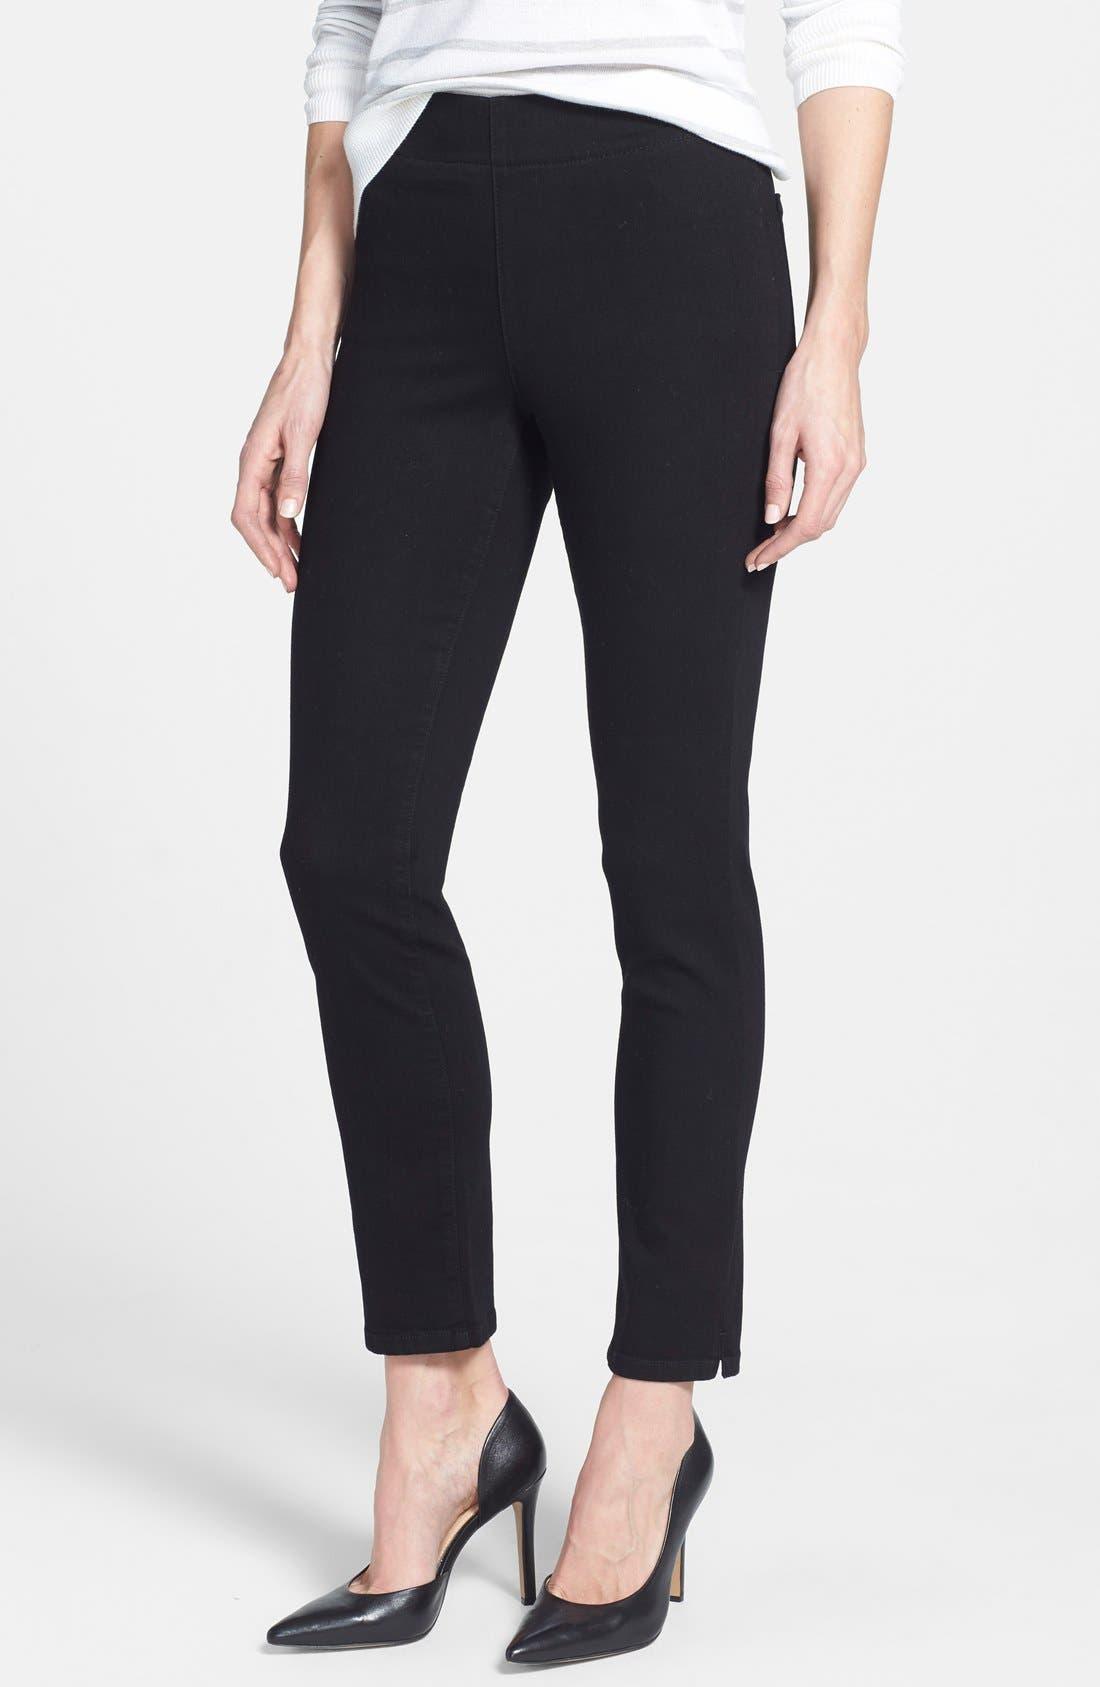 Main Image - NYDJ Alina Stretch Ankle Jeans (Black) (Regular & Petite)